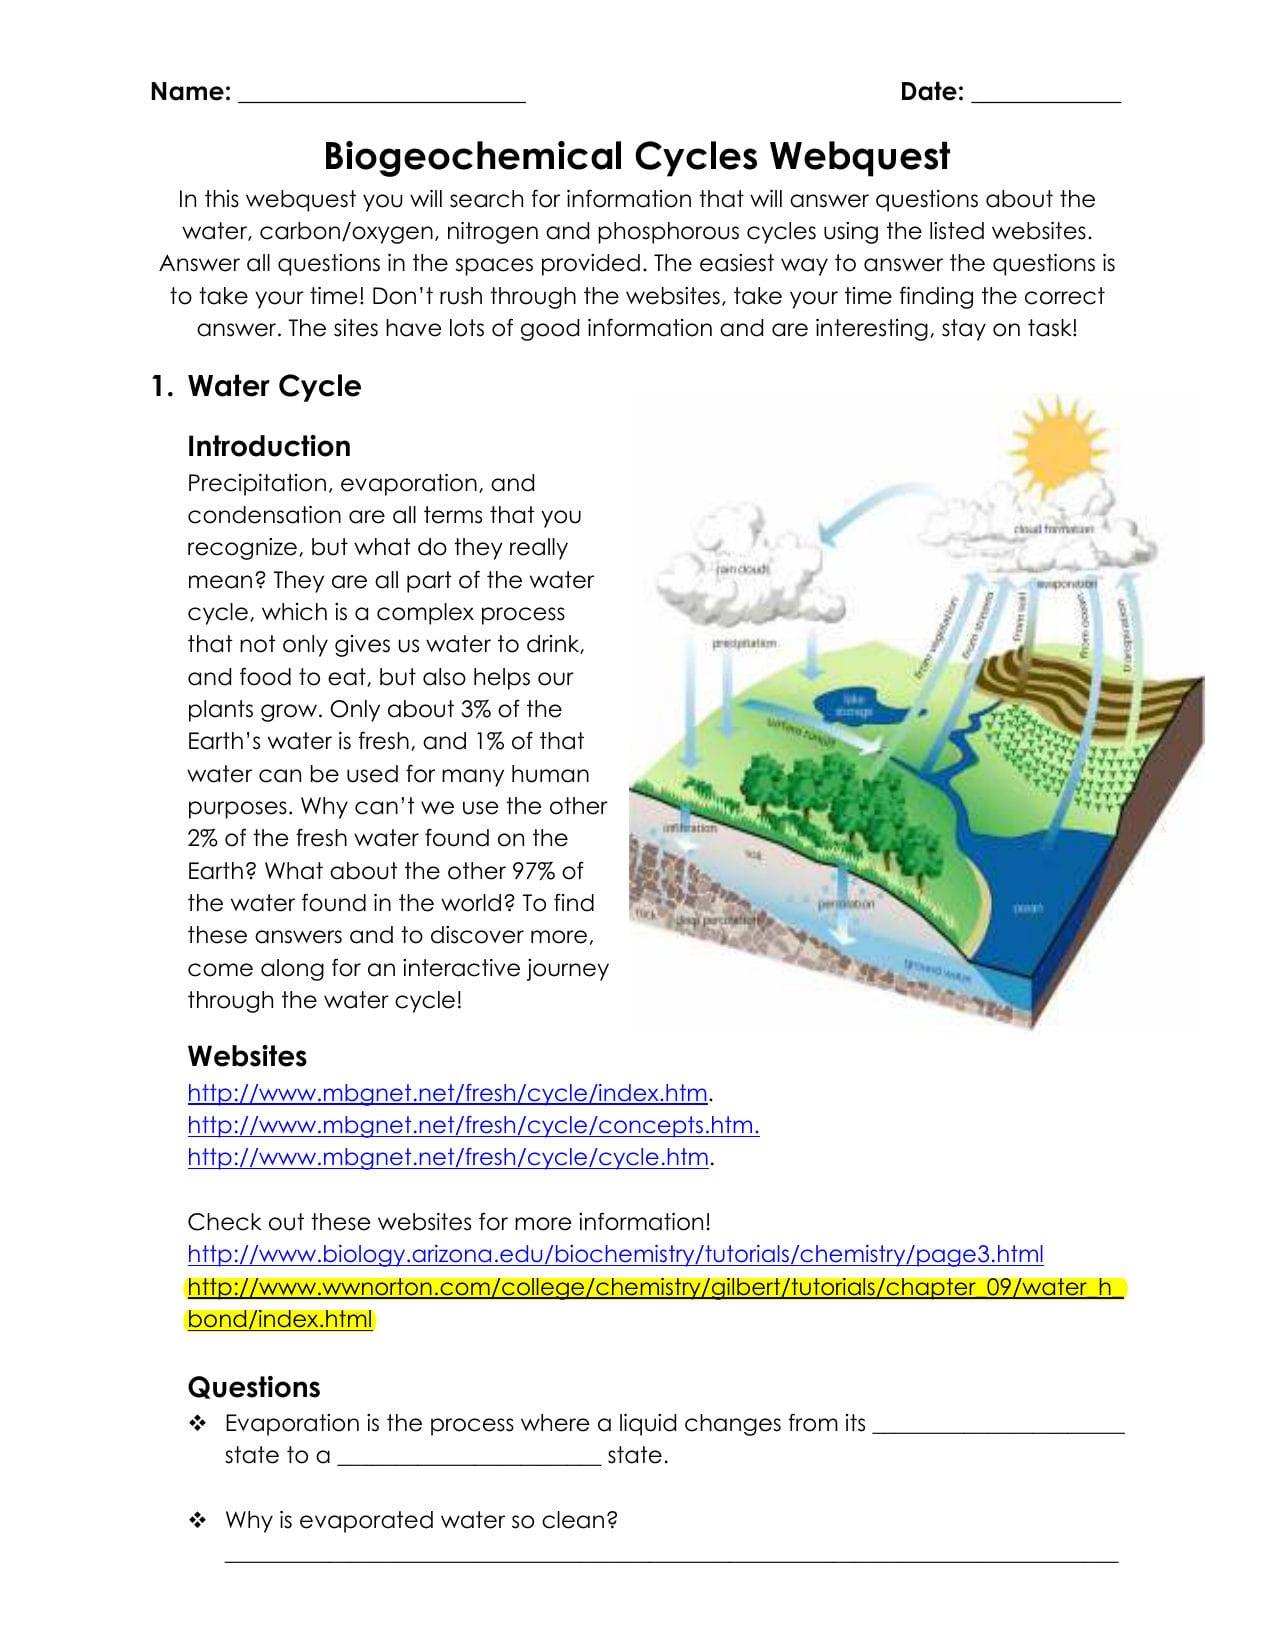 Biogeochemical Cycles Webquest For Biogeochemical Cycles Worksheet Answers